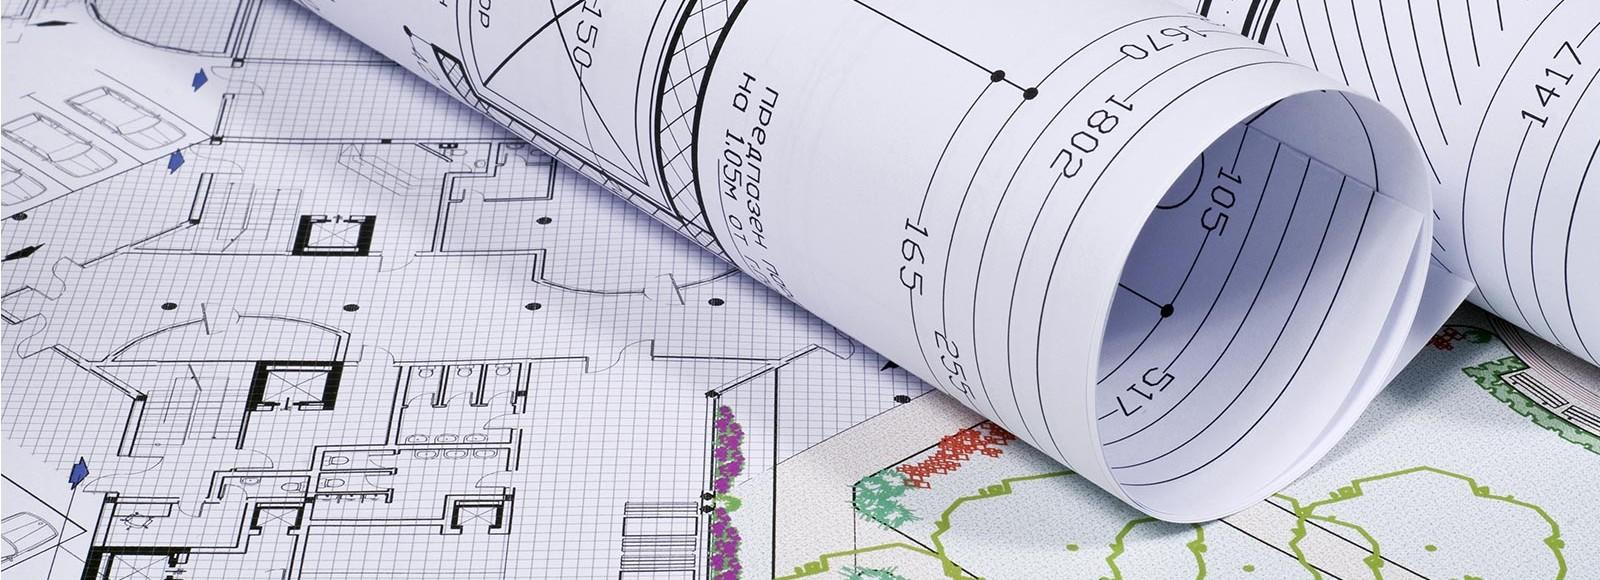 land-planning-new